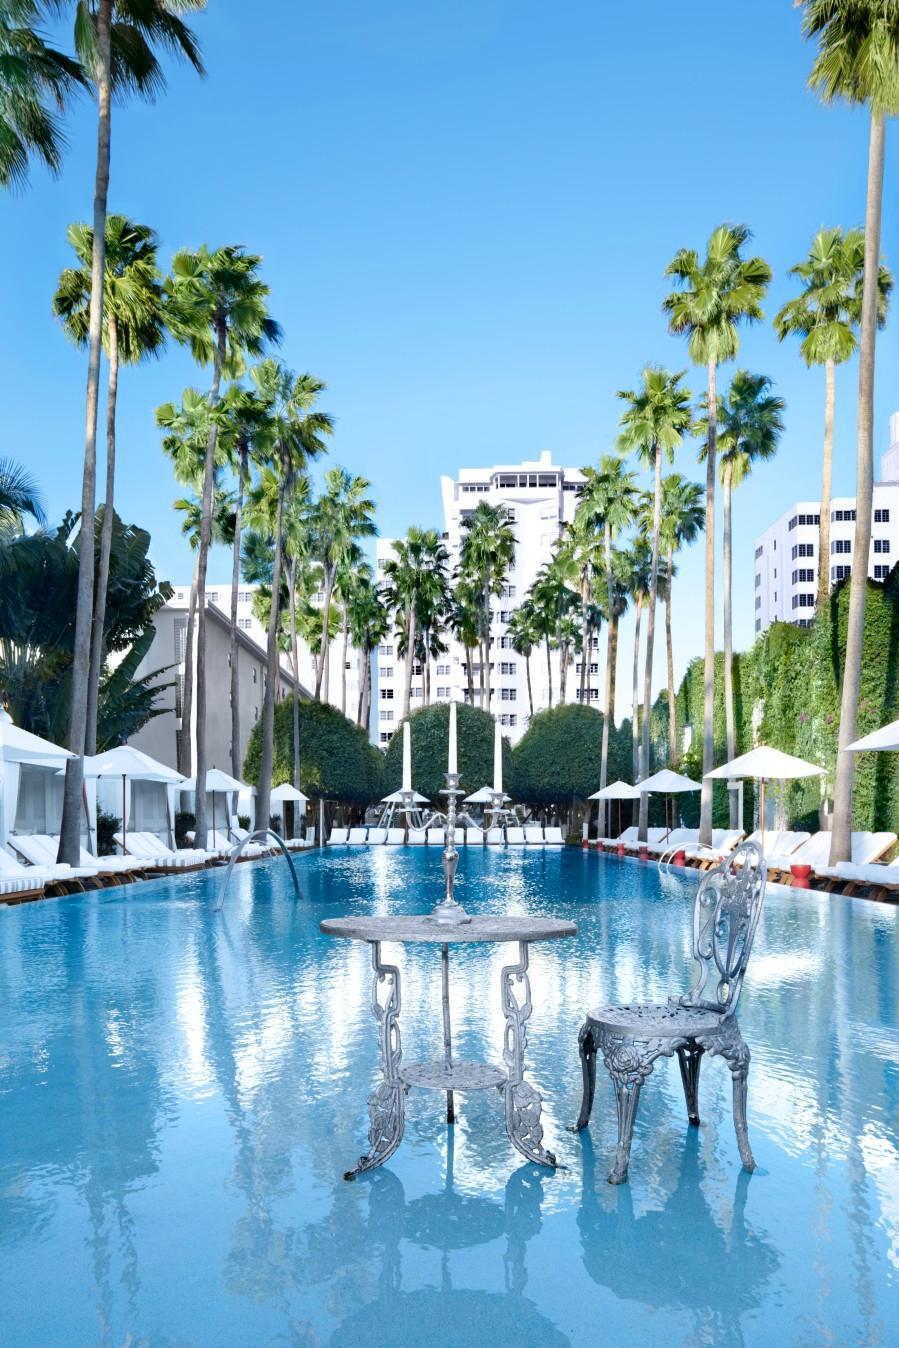 Miami beach casino review of casinos in atlantic city